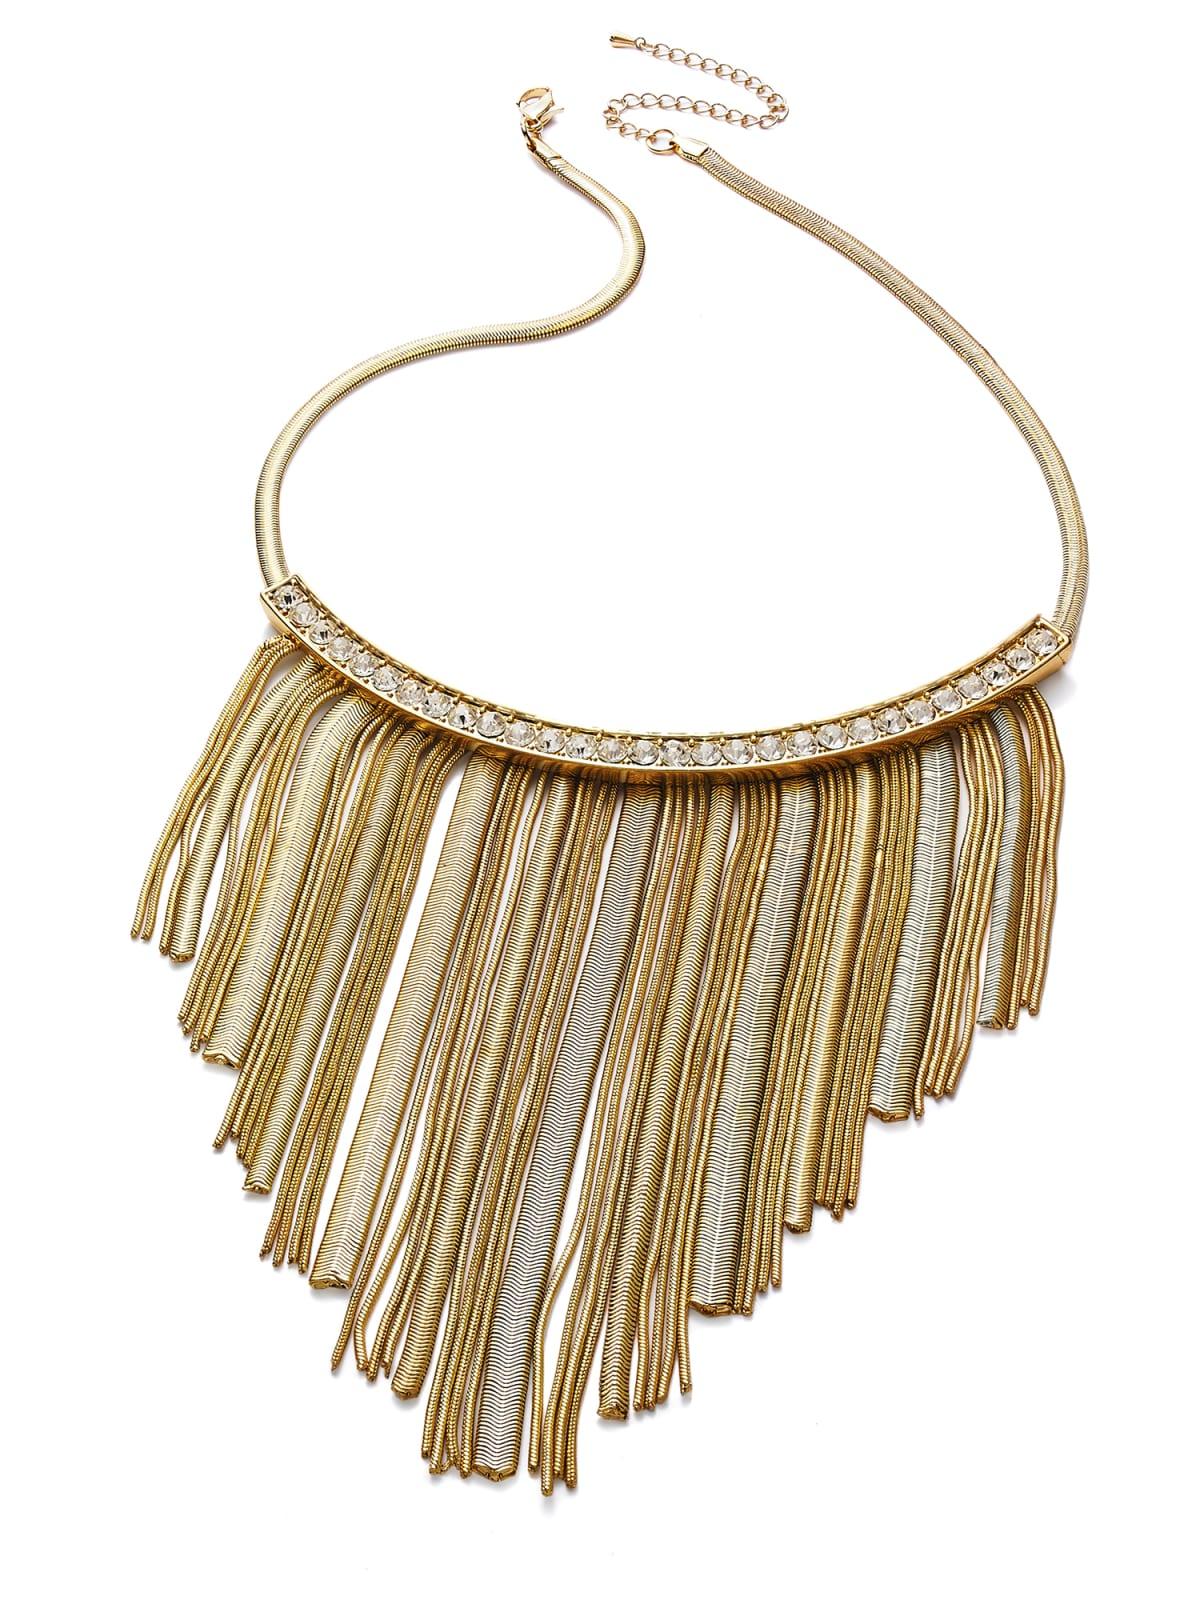 Thalia necklace at Macy's